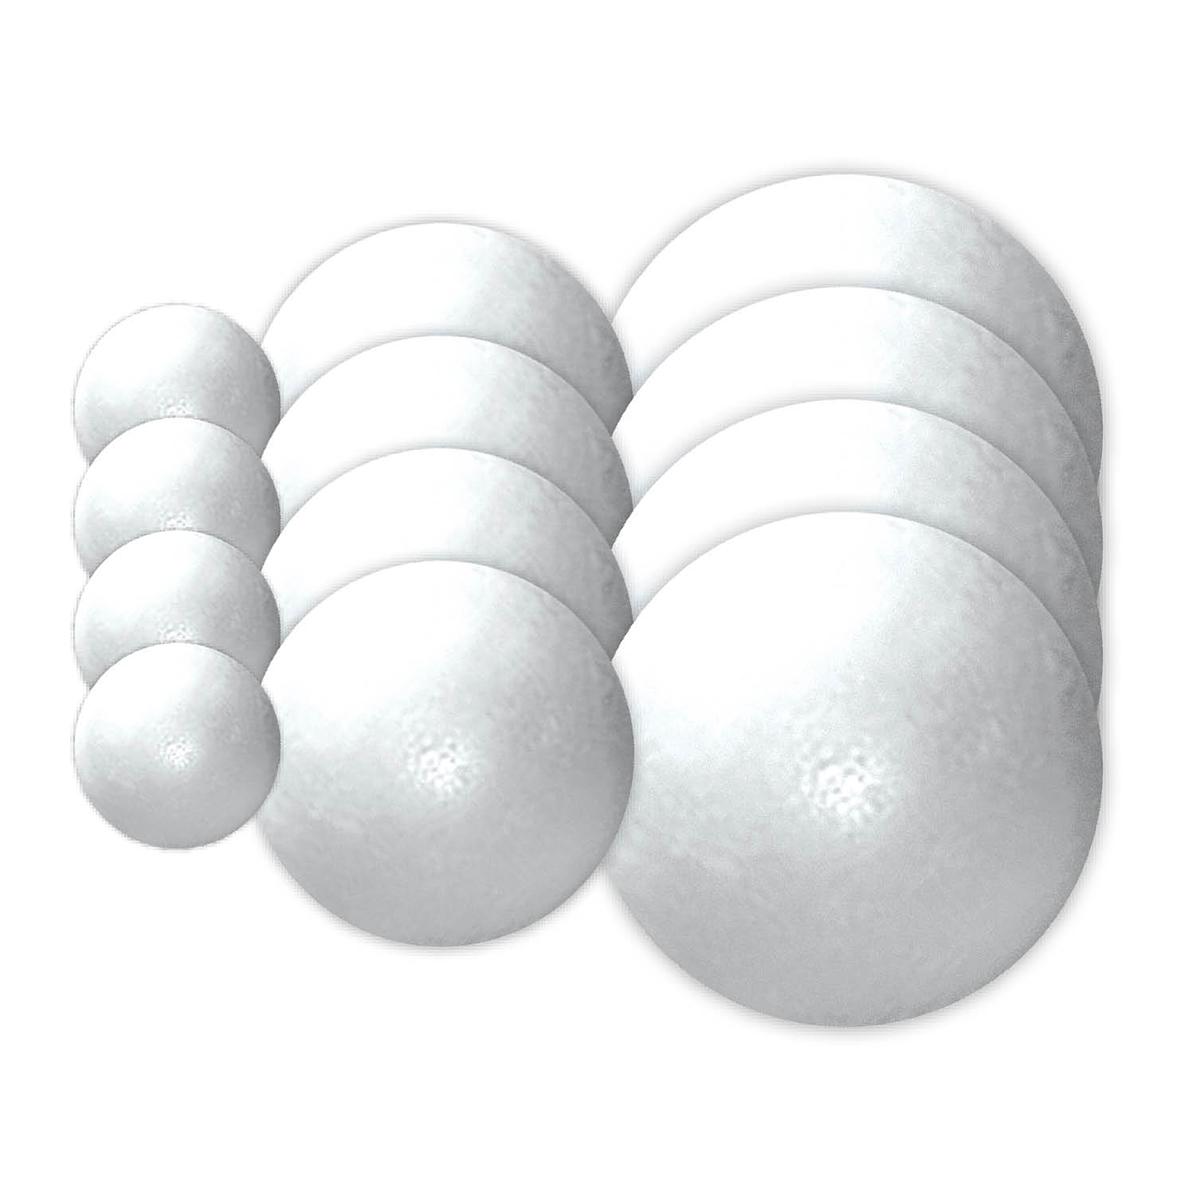 Balles en styromousse